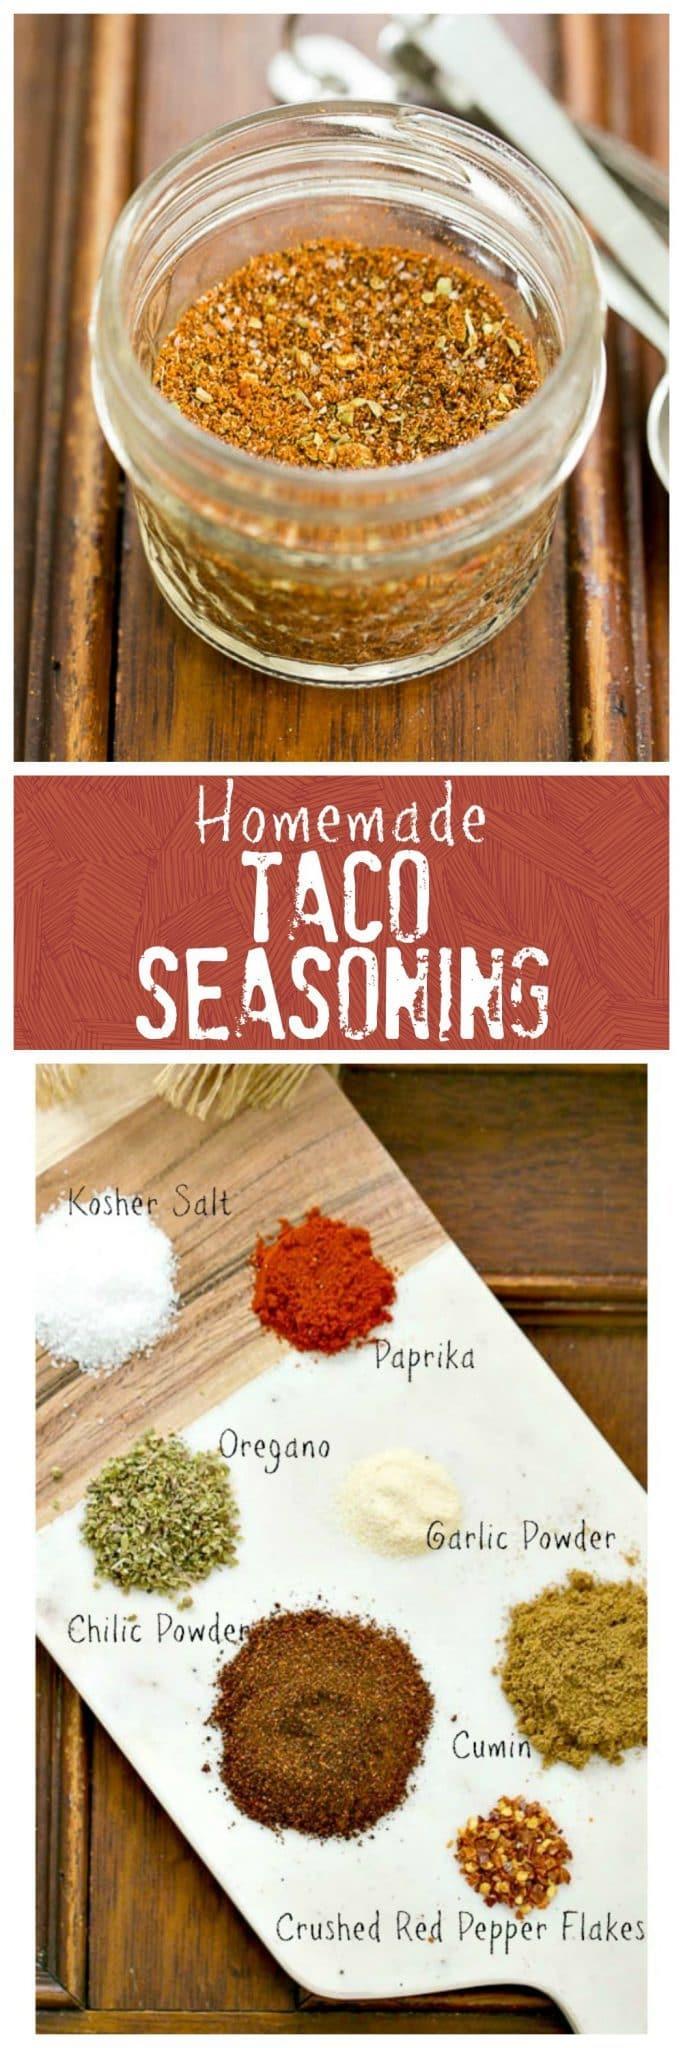 Homemade Taco Seasoning!